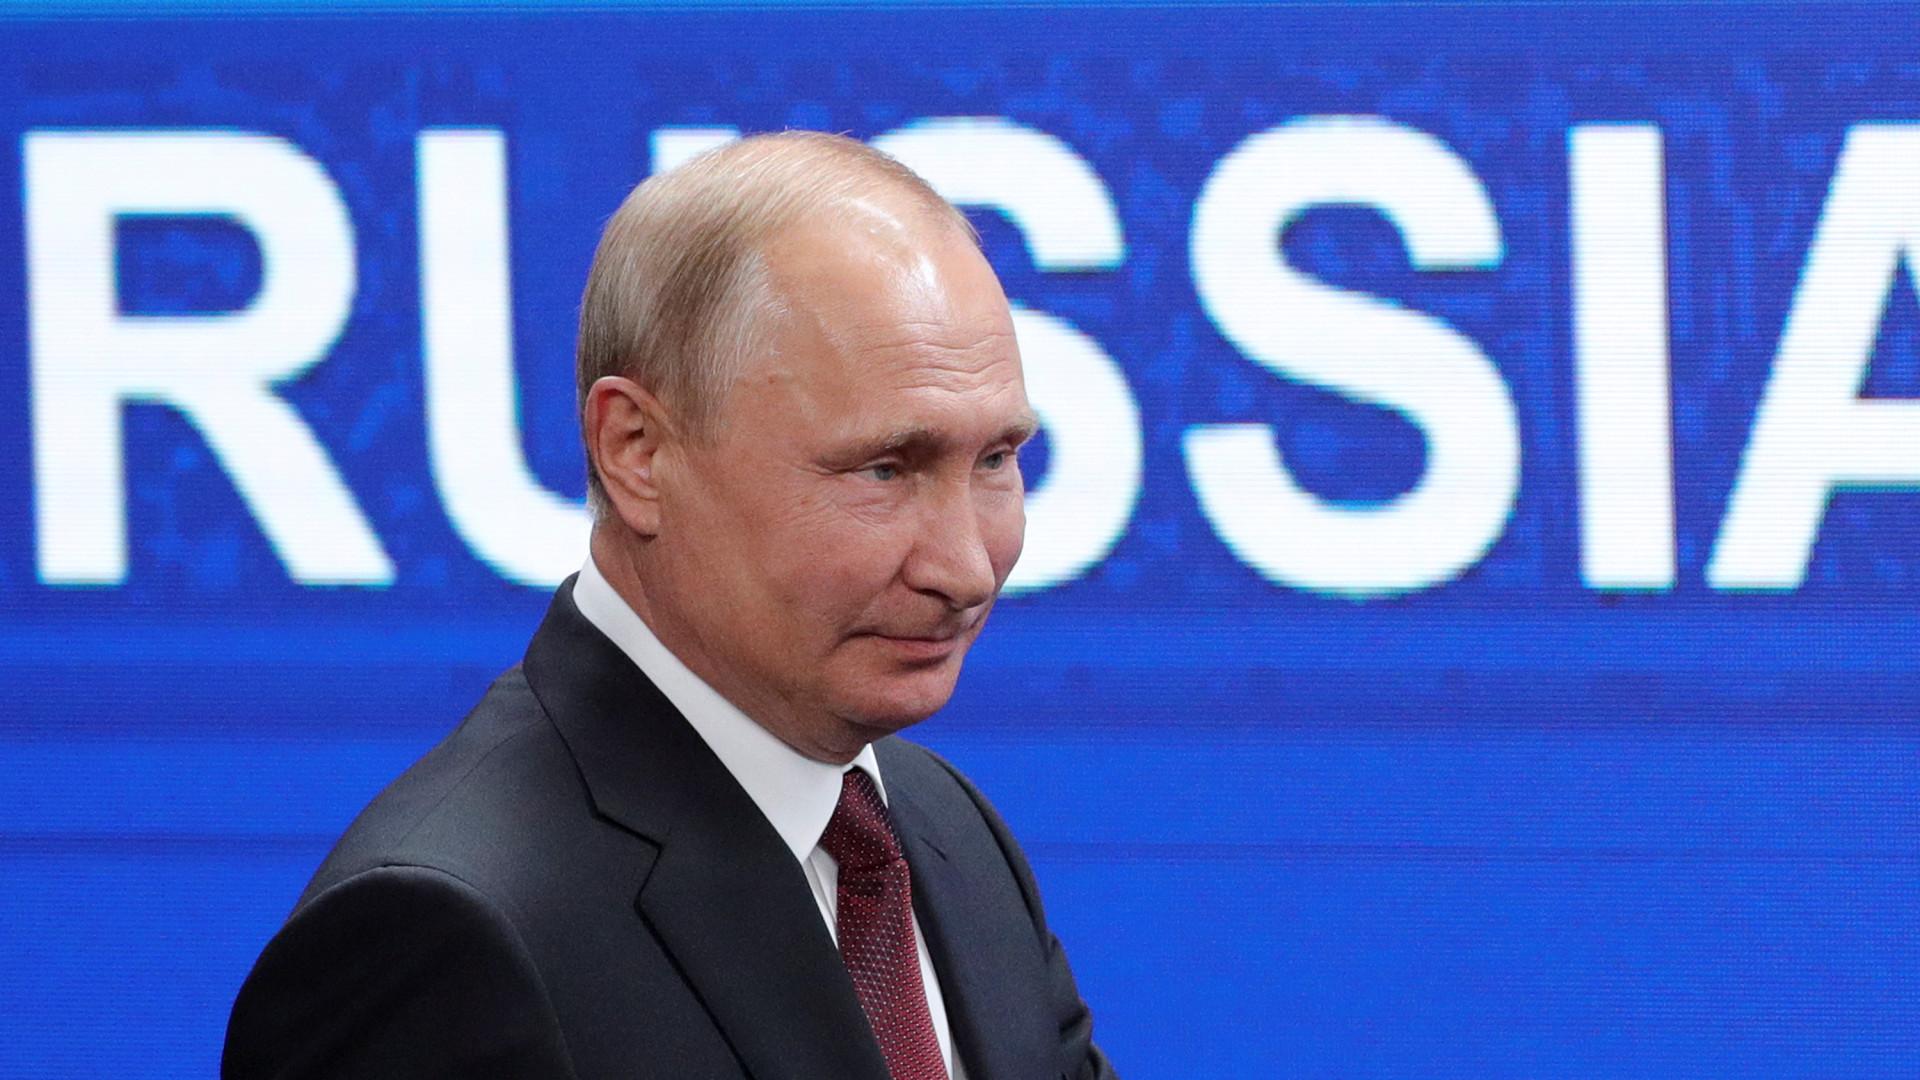 Putin convidou Kim Jong-Un a visitar a Rússia em setembro